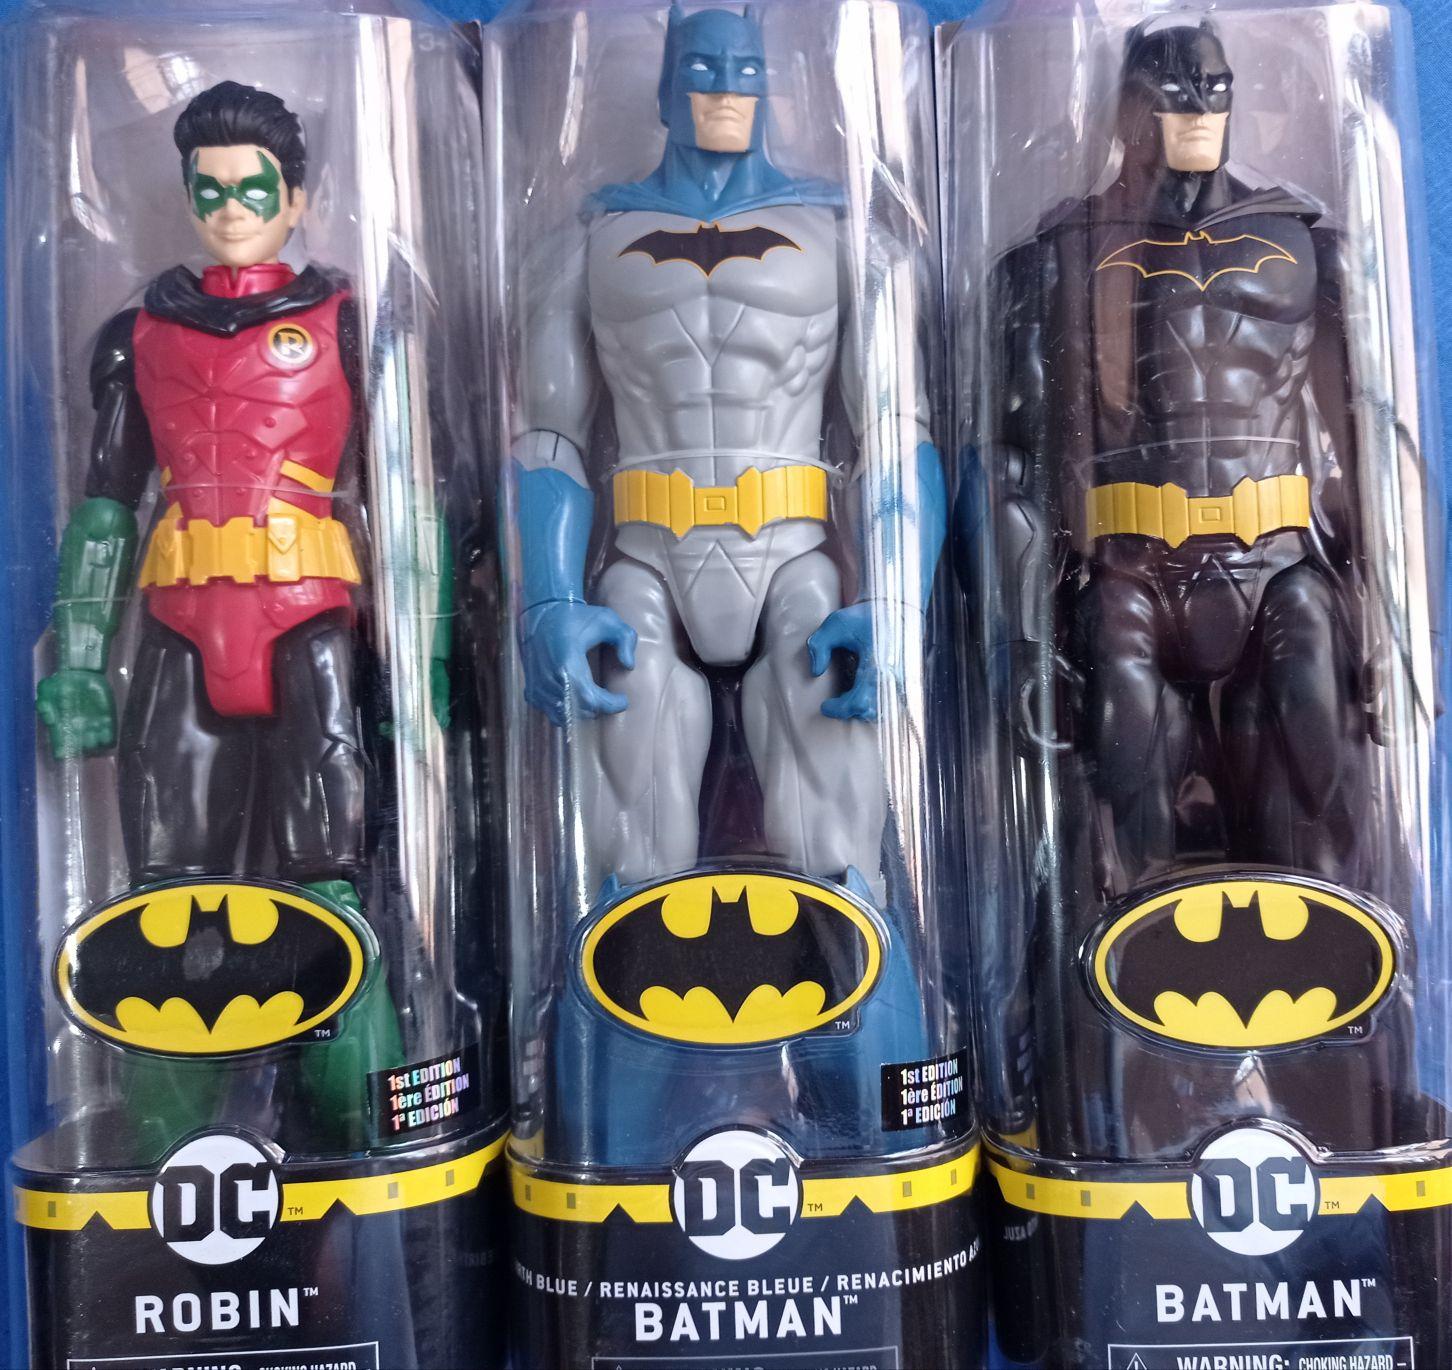 Bodega Aurrerá, Batman y Robin de SpinMaster